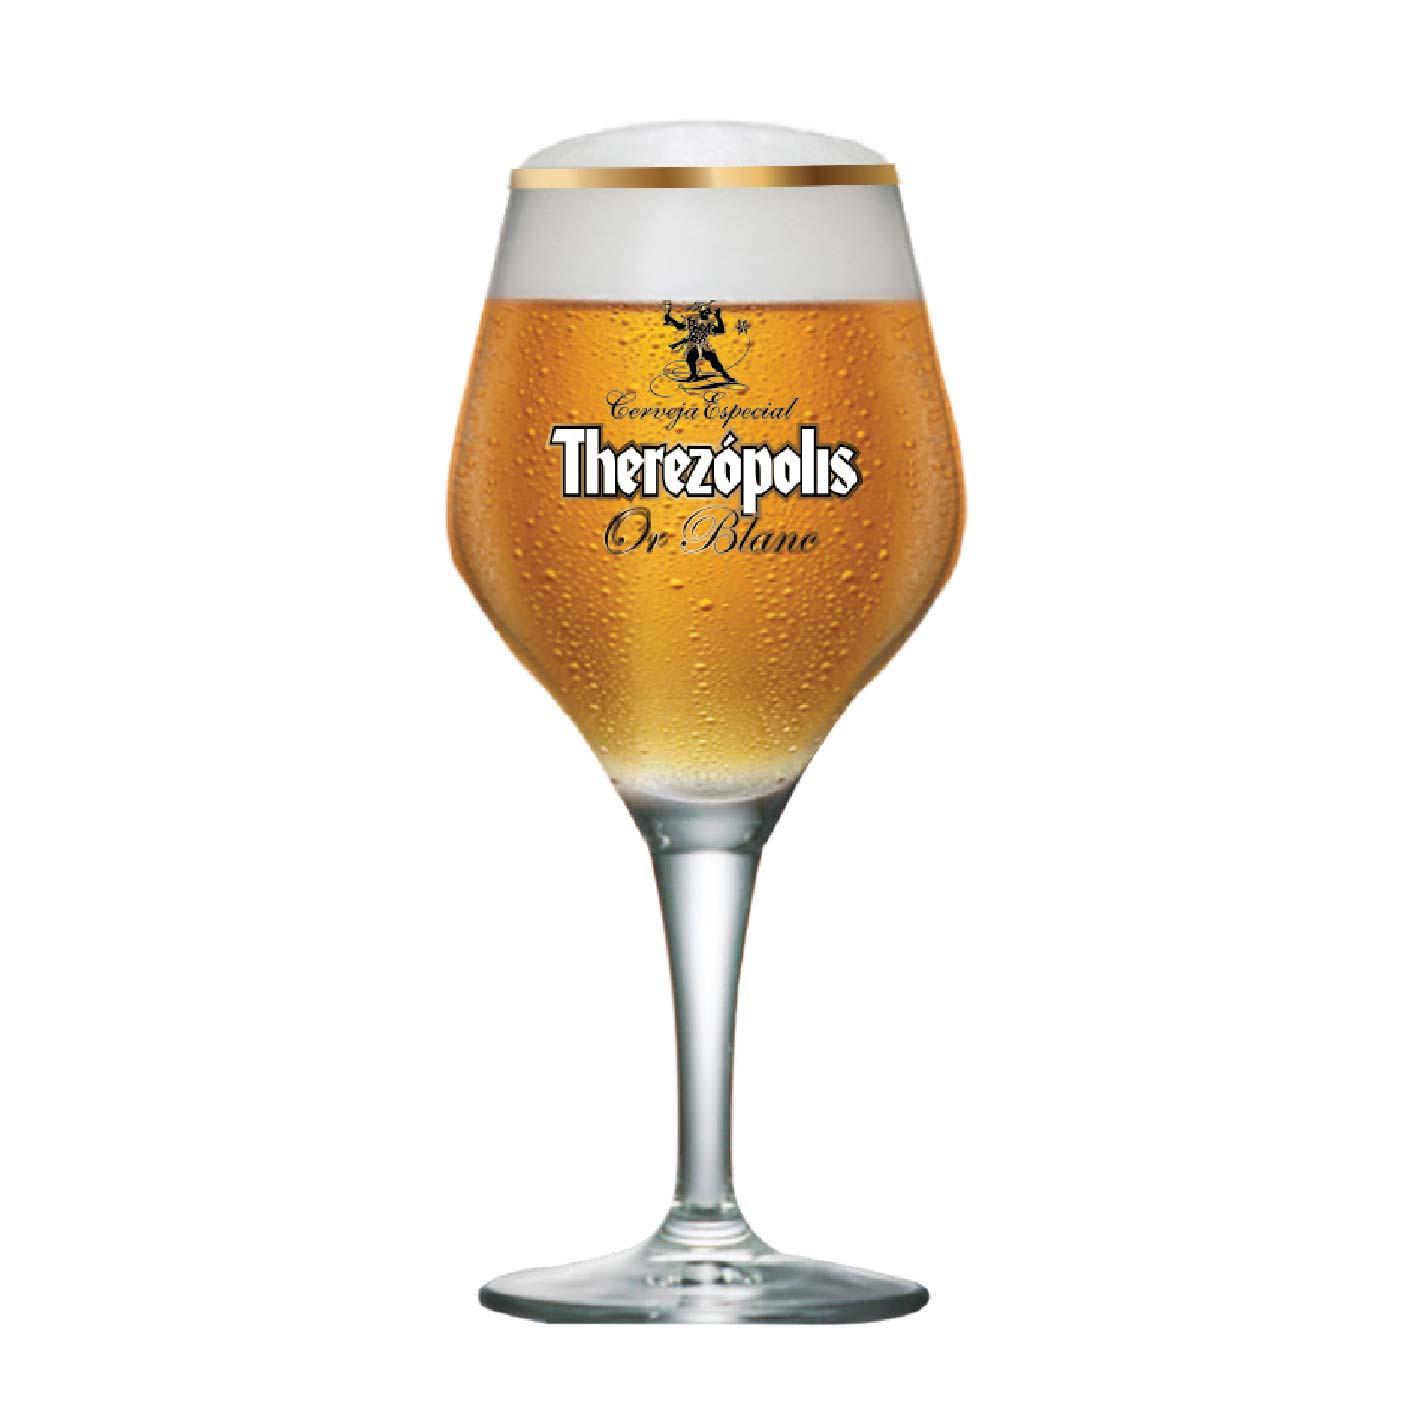 Taça de Cerveja Therezopolis Or Blanc Cristal 615ml